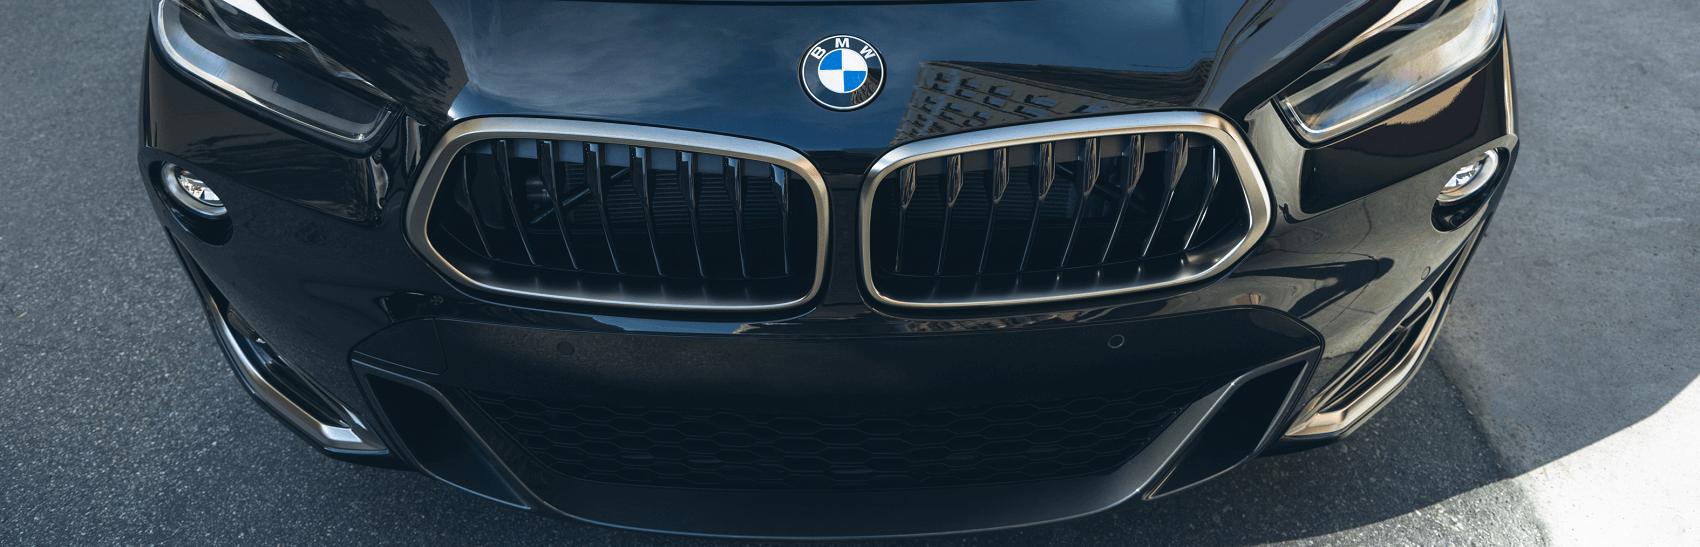 BMW X2 Design